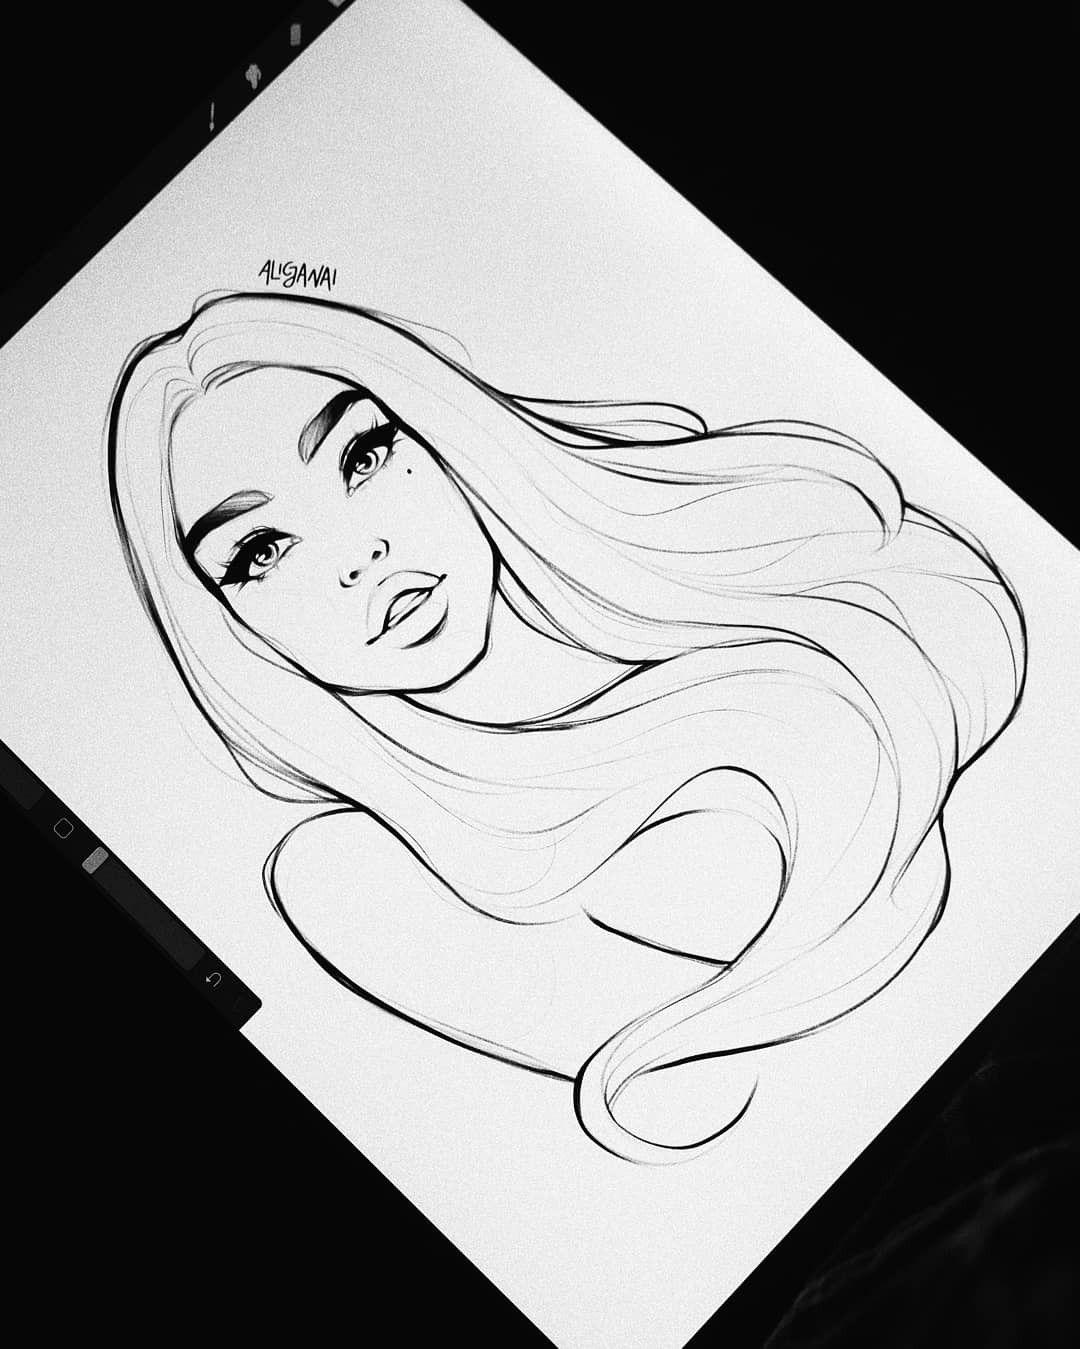 Digital Sketch of A Girl on iPad, Procreate  by AlicjaNai